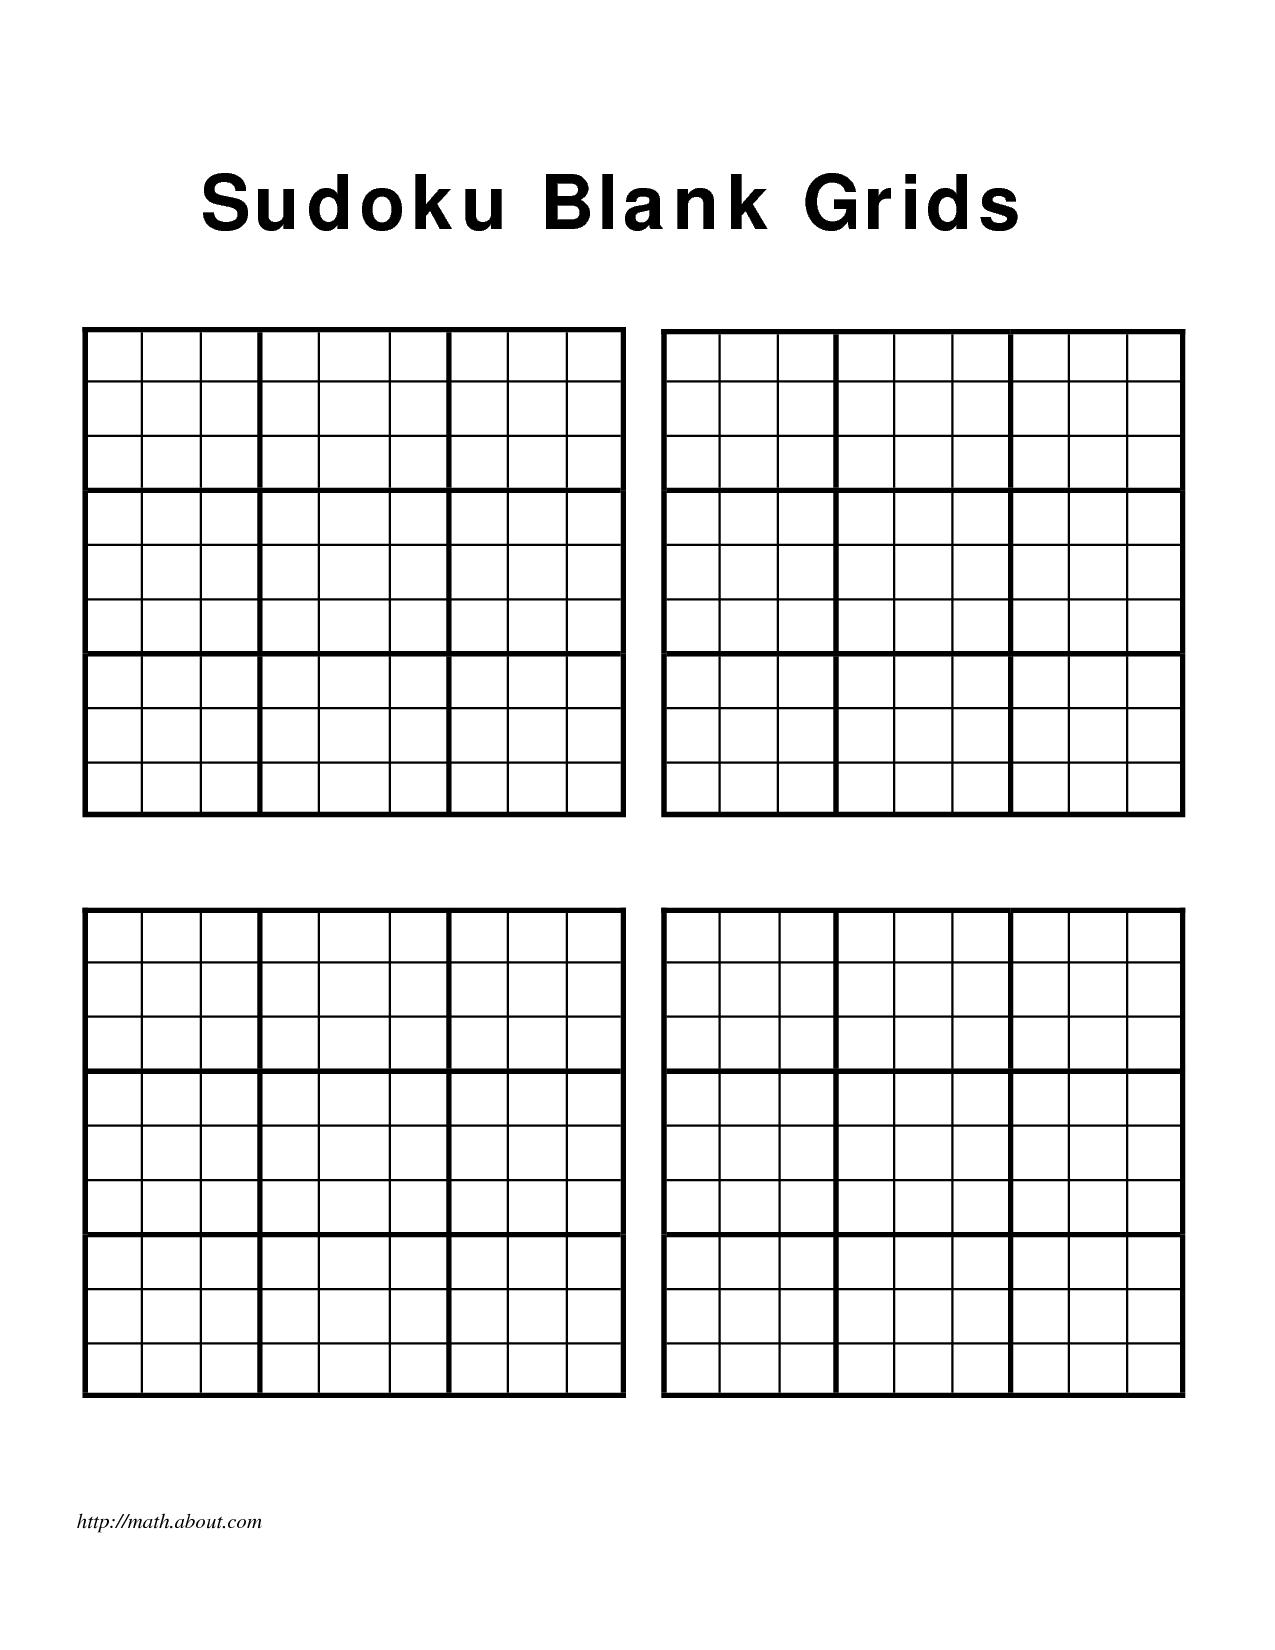 Printable Sudoku Grids 2 Per Page